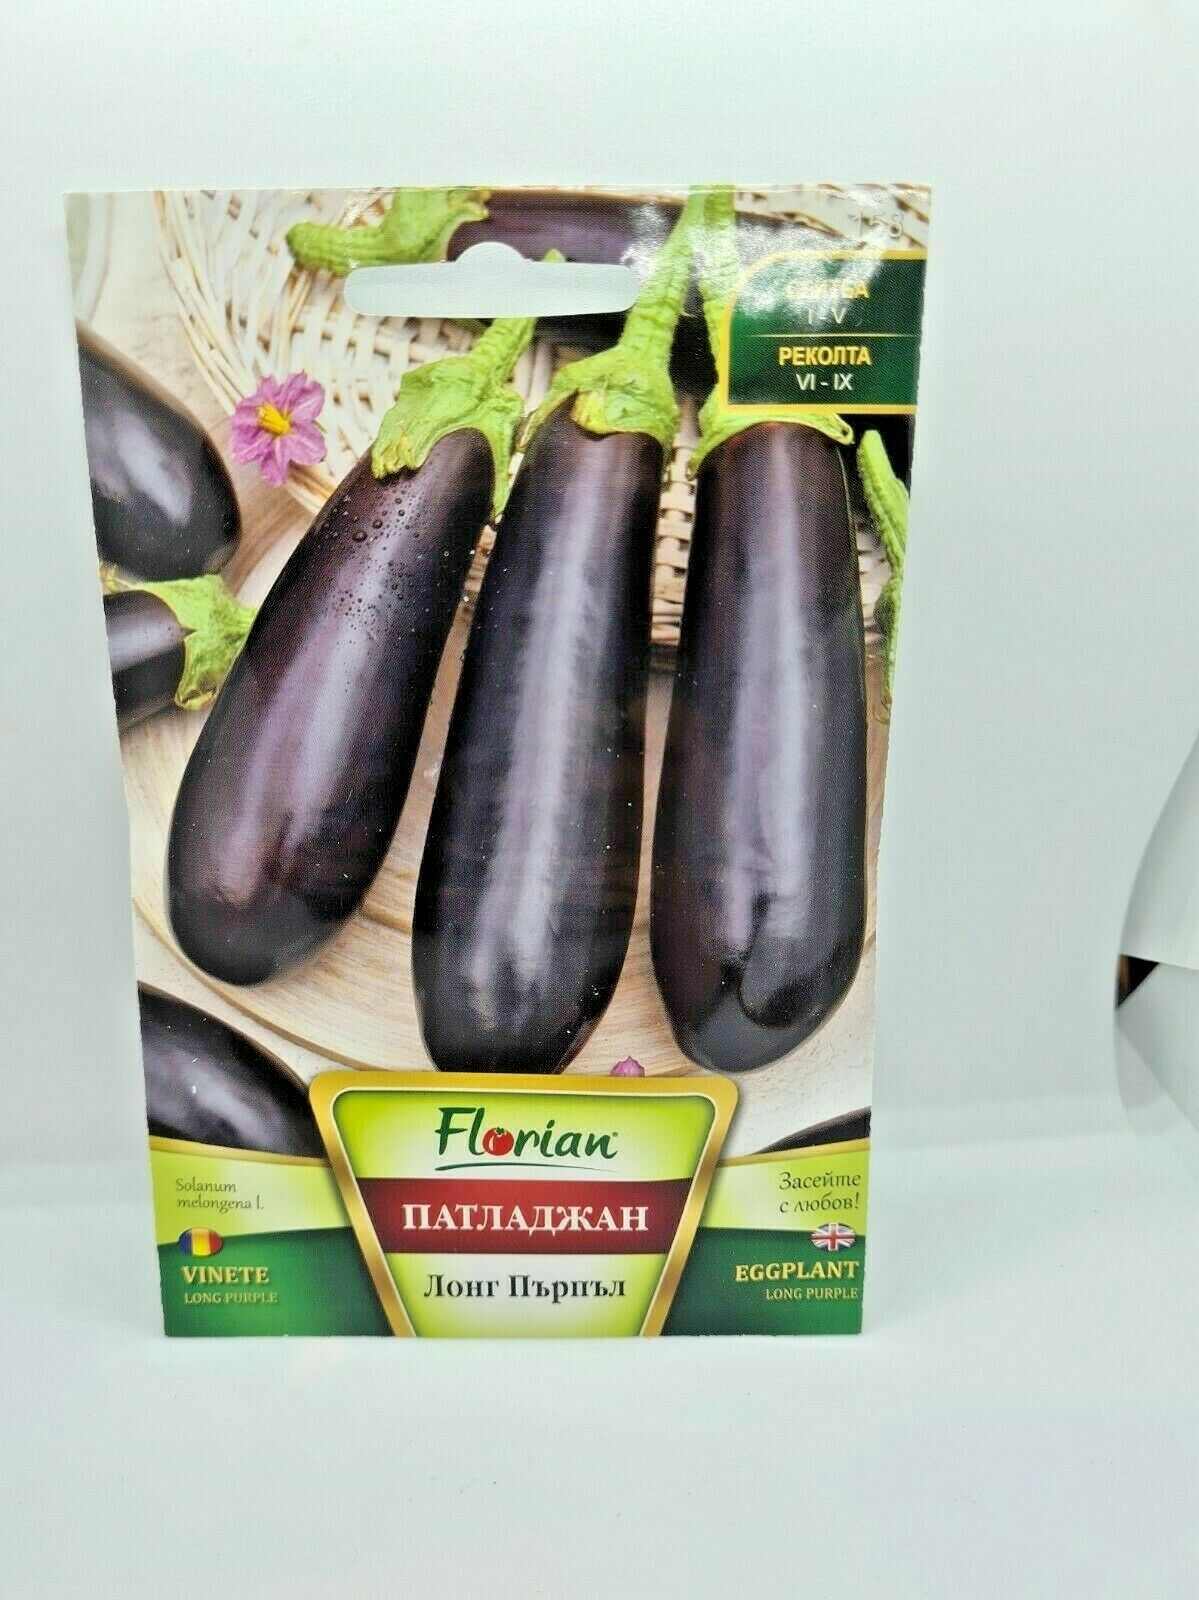 Long Purple Eggplant Aubergine Dark Vegetable apx. 270 Seeds -25cm long Fruit